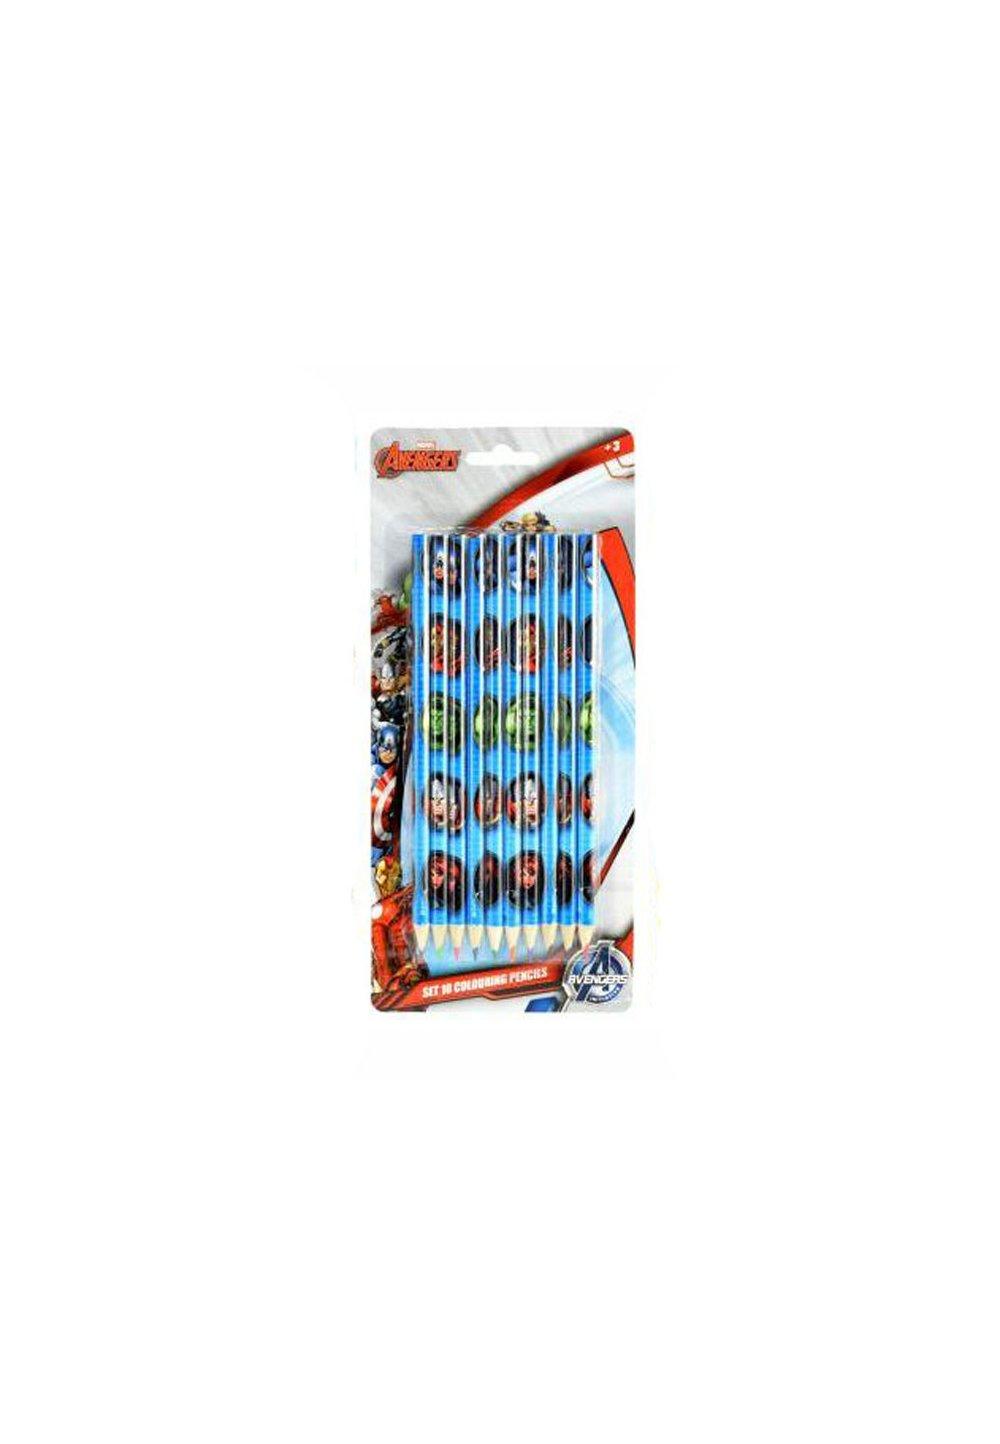 Set 10 creioane colorate, Avengers imagine